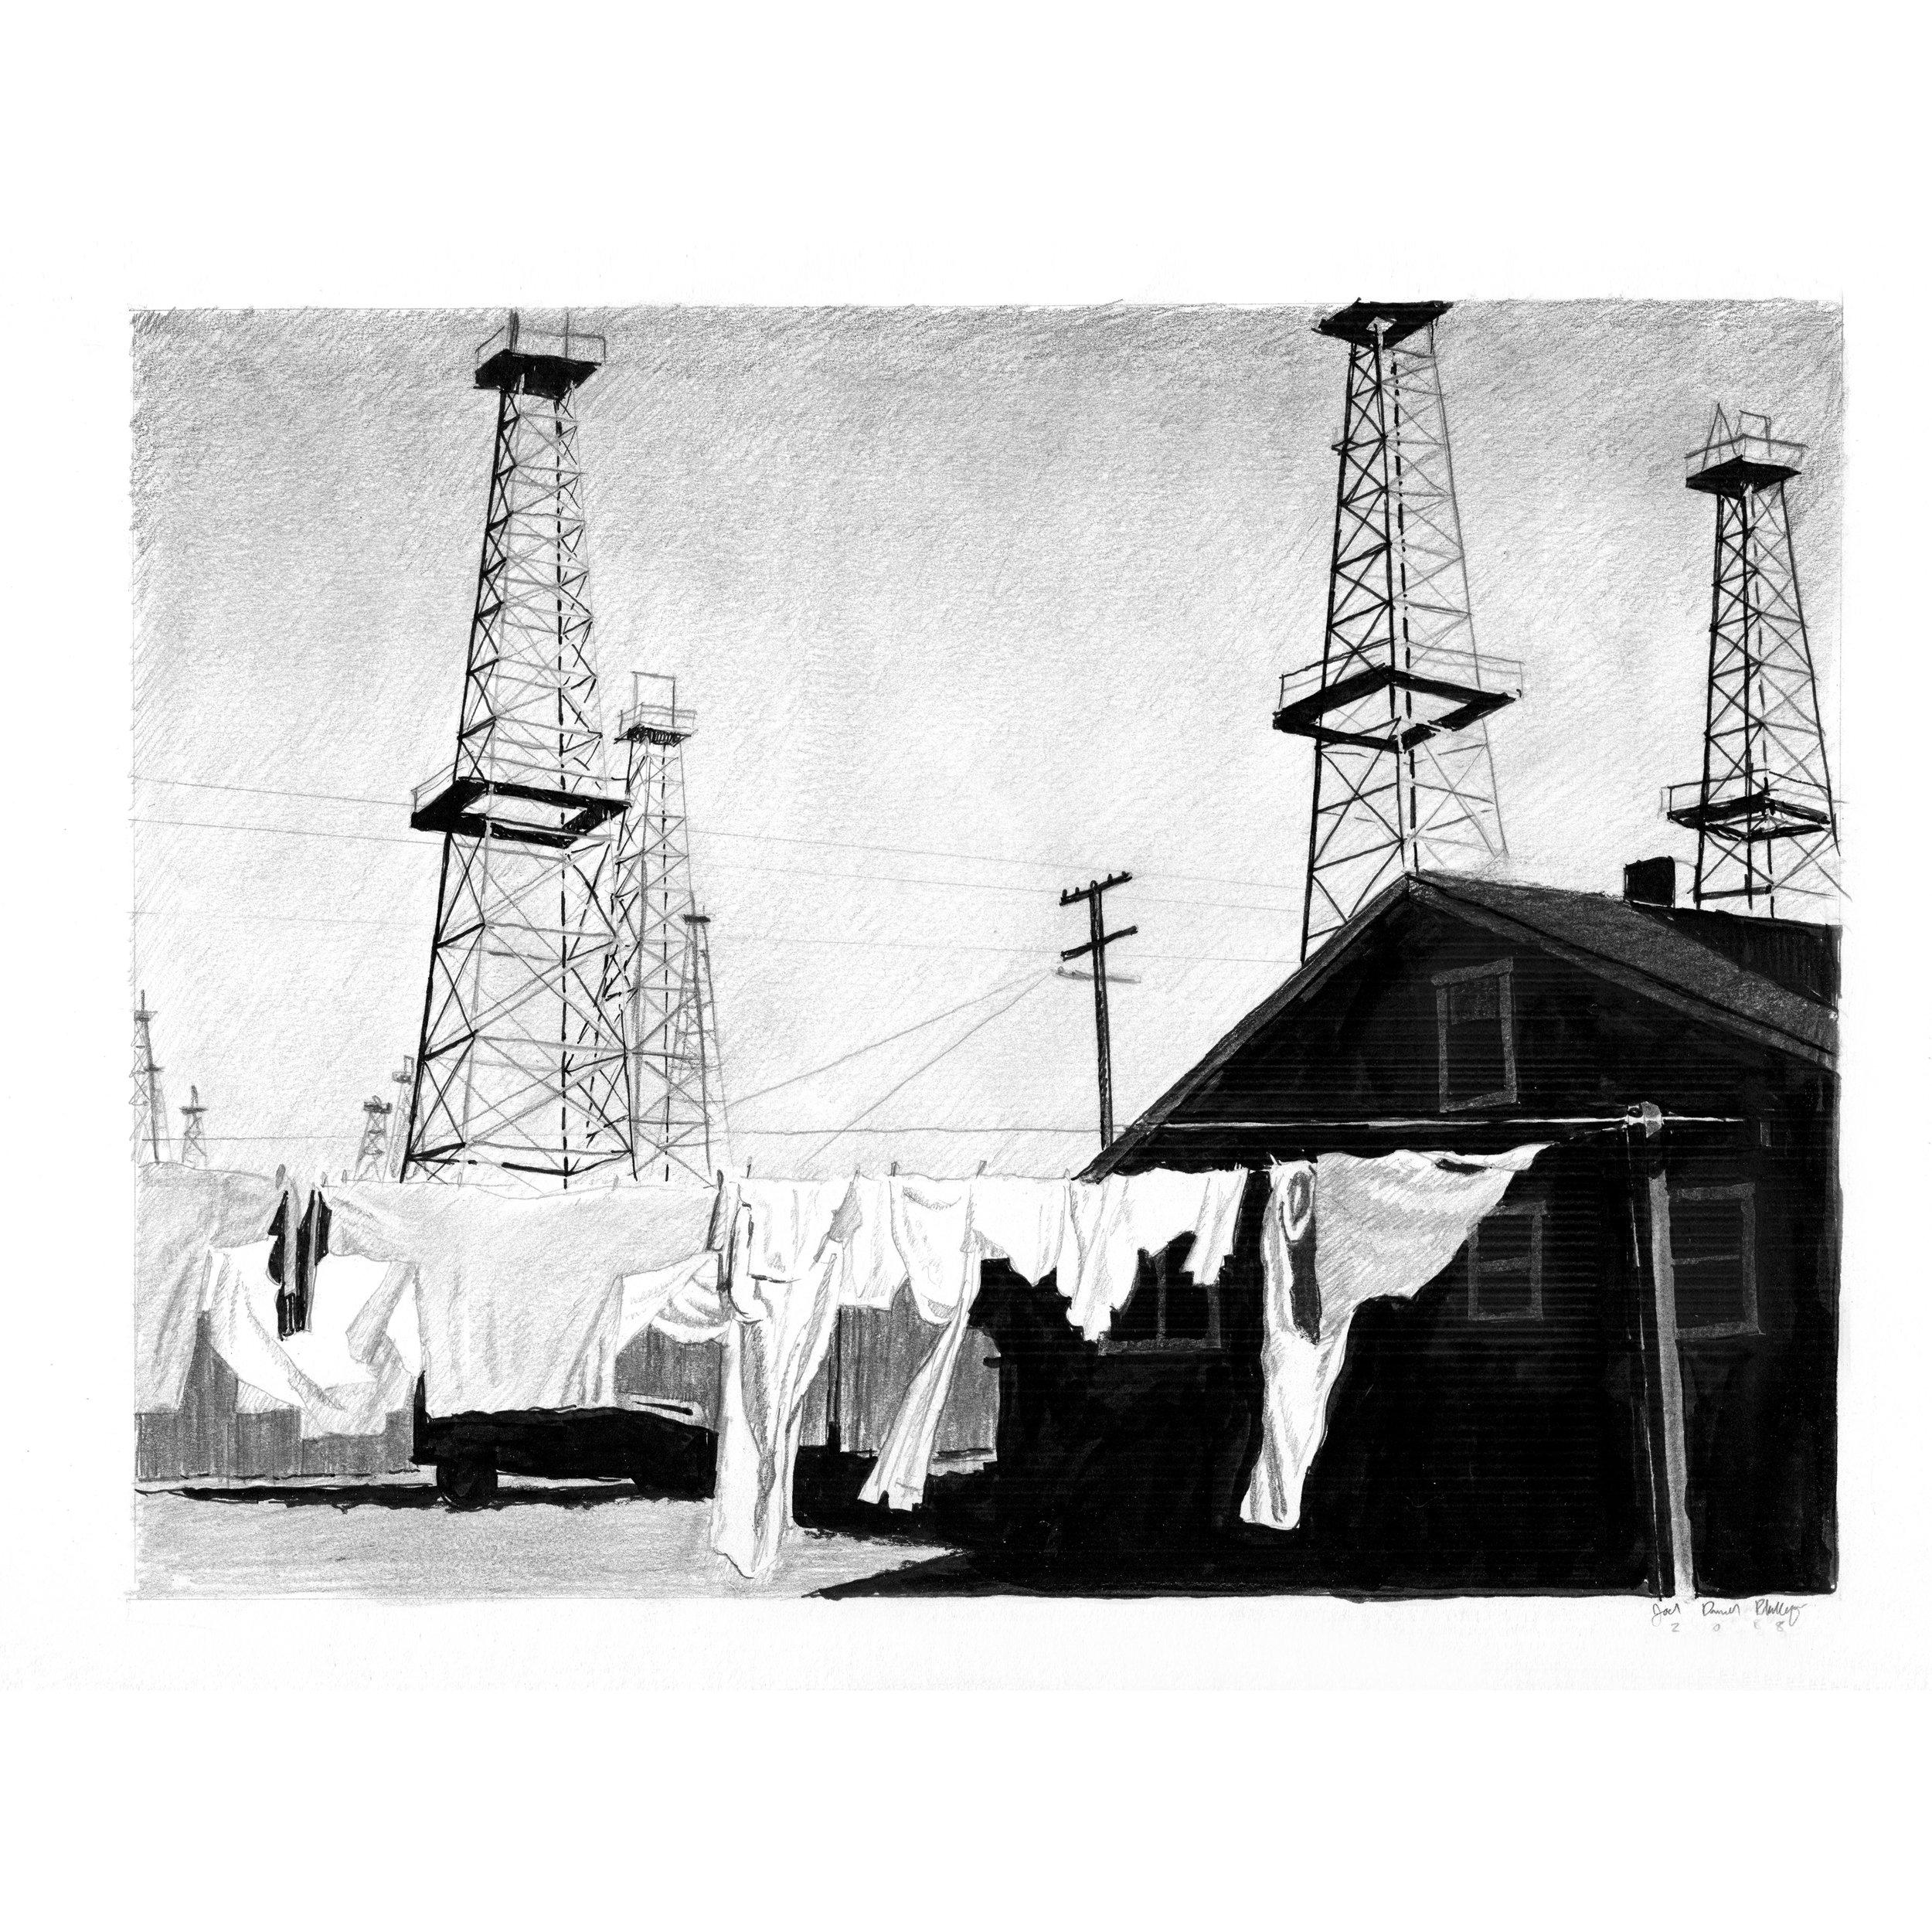 Laundry Dries on a Clothesline Near the Venice Oilfield